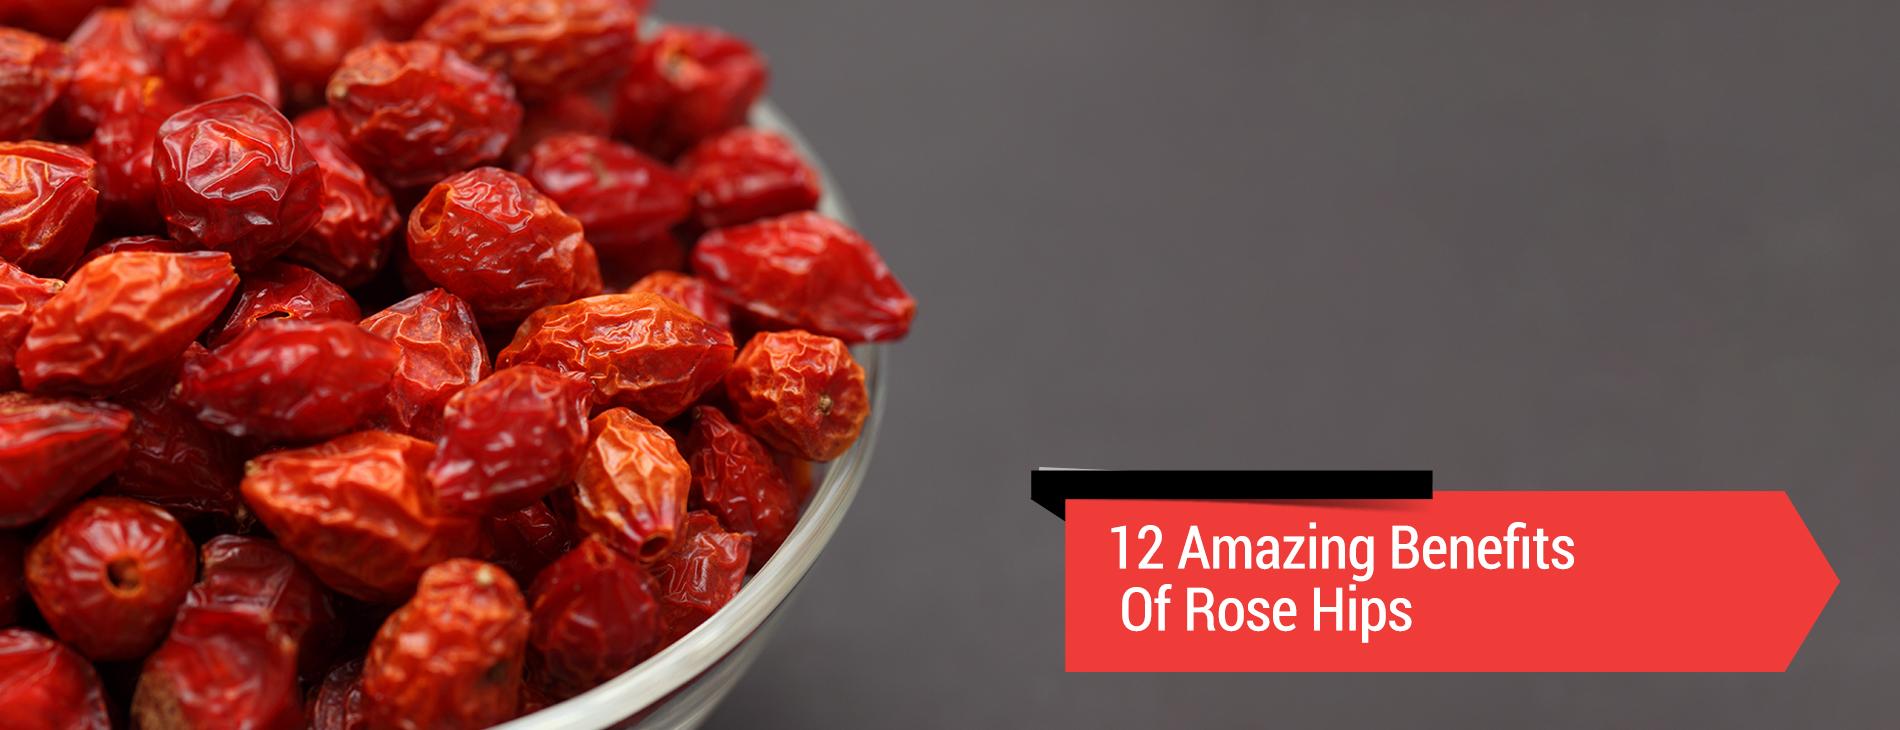 12-Amazing-Benefits-Of-Rose-Hips